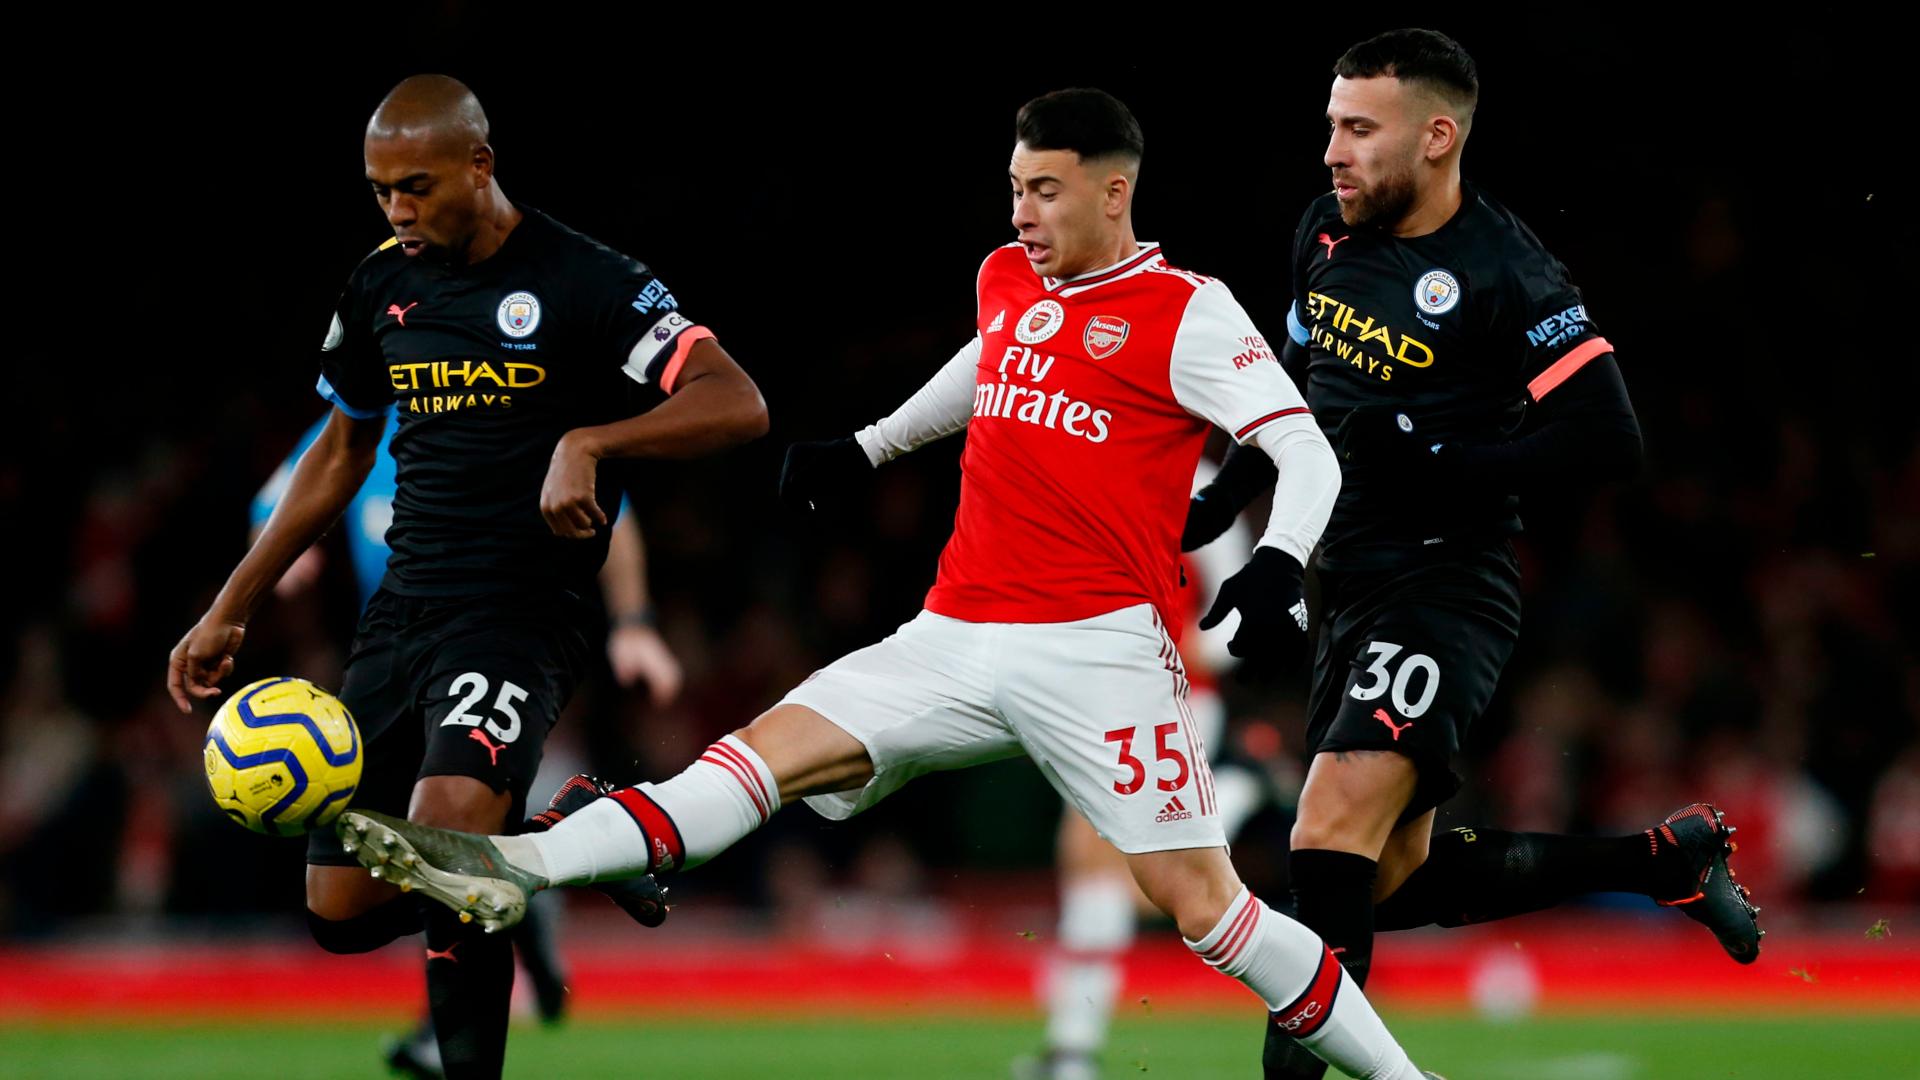 Resmi Partai Tunda Manchester City Vs Arsenal Digelar 12 Maret 2020 Goal Com